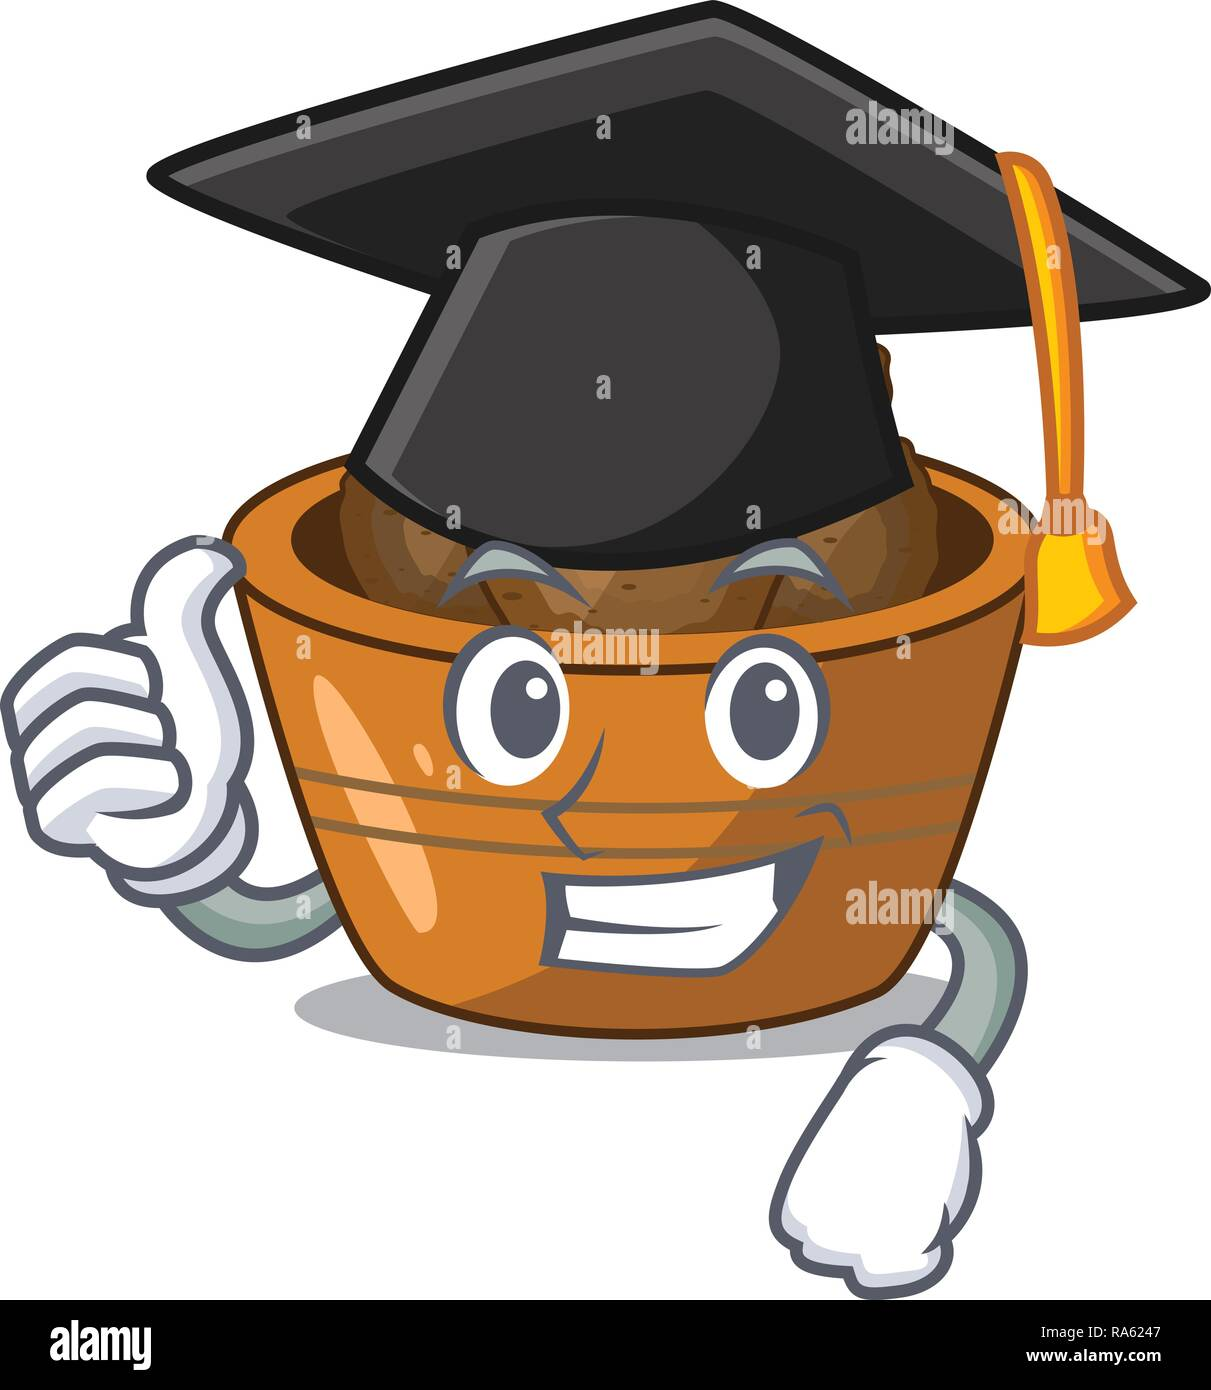 Graduation gulab jamun on the character table - Stock Vector